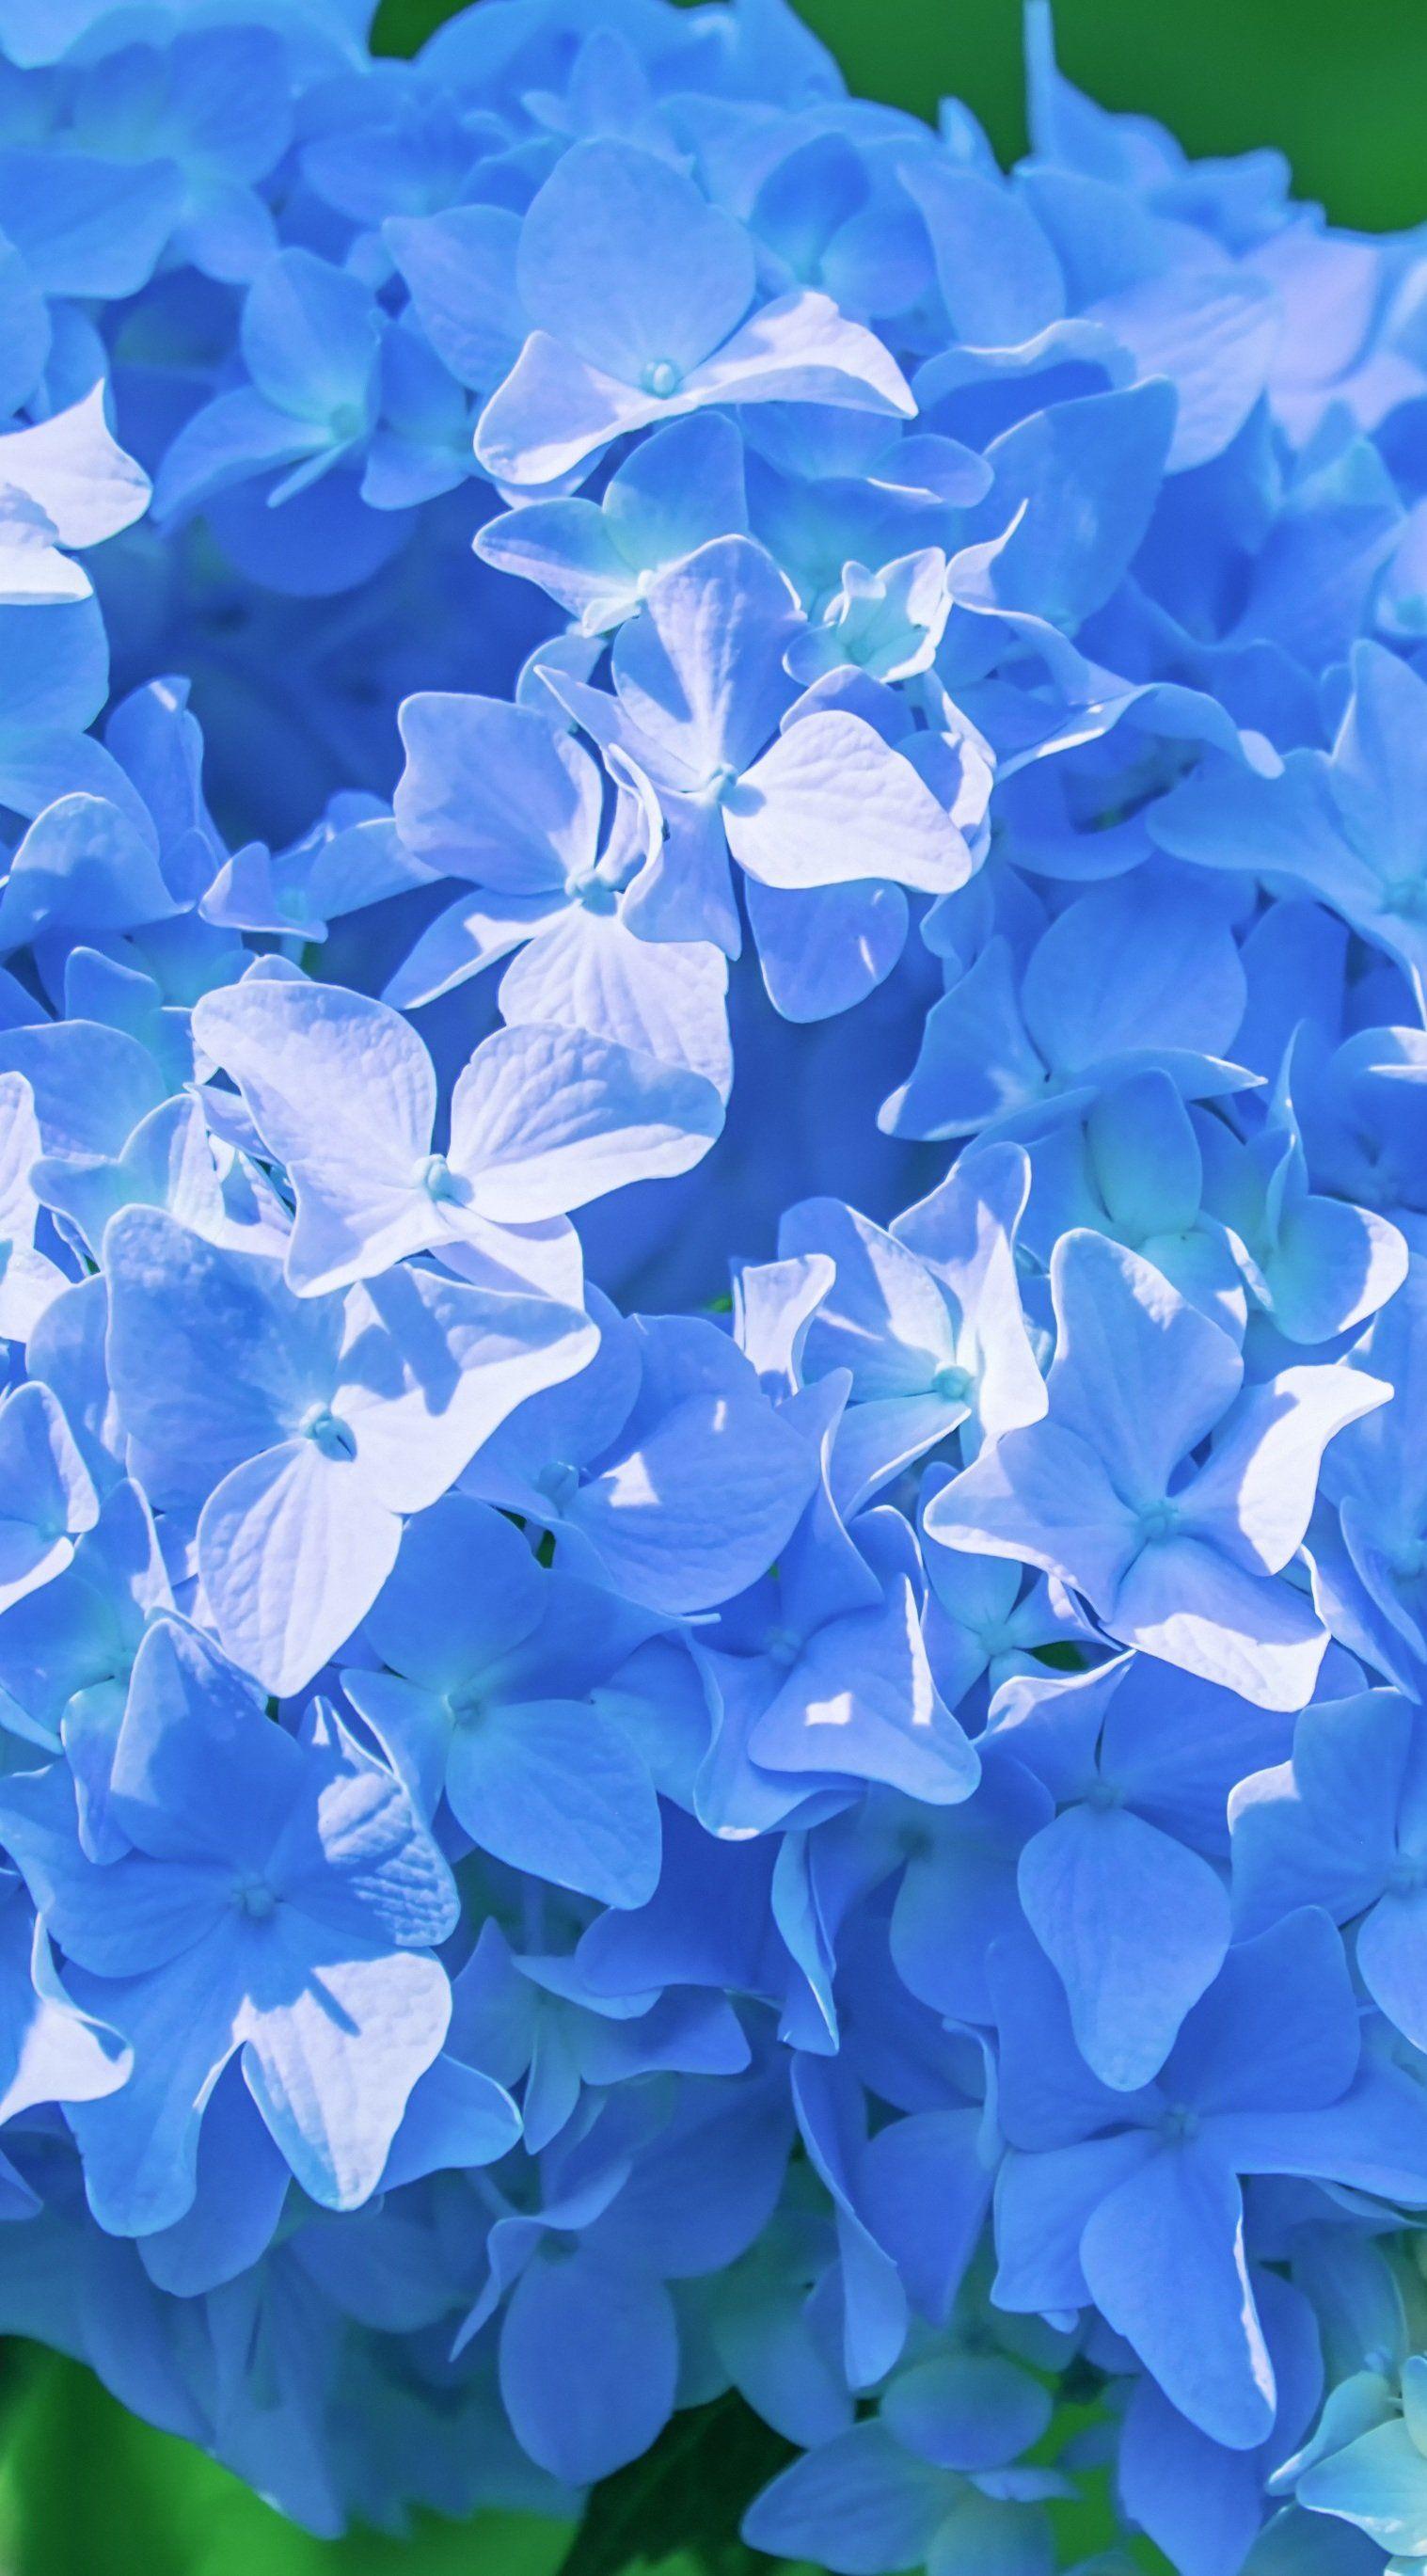 Blue Flowers Flower Background Wallpaper Hydrangea Wallpaper Blue Wallpaper Iphone